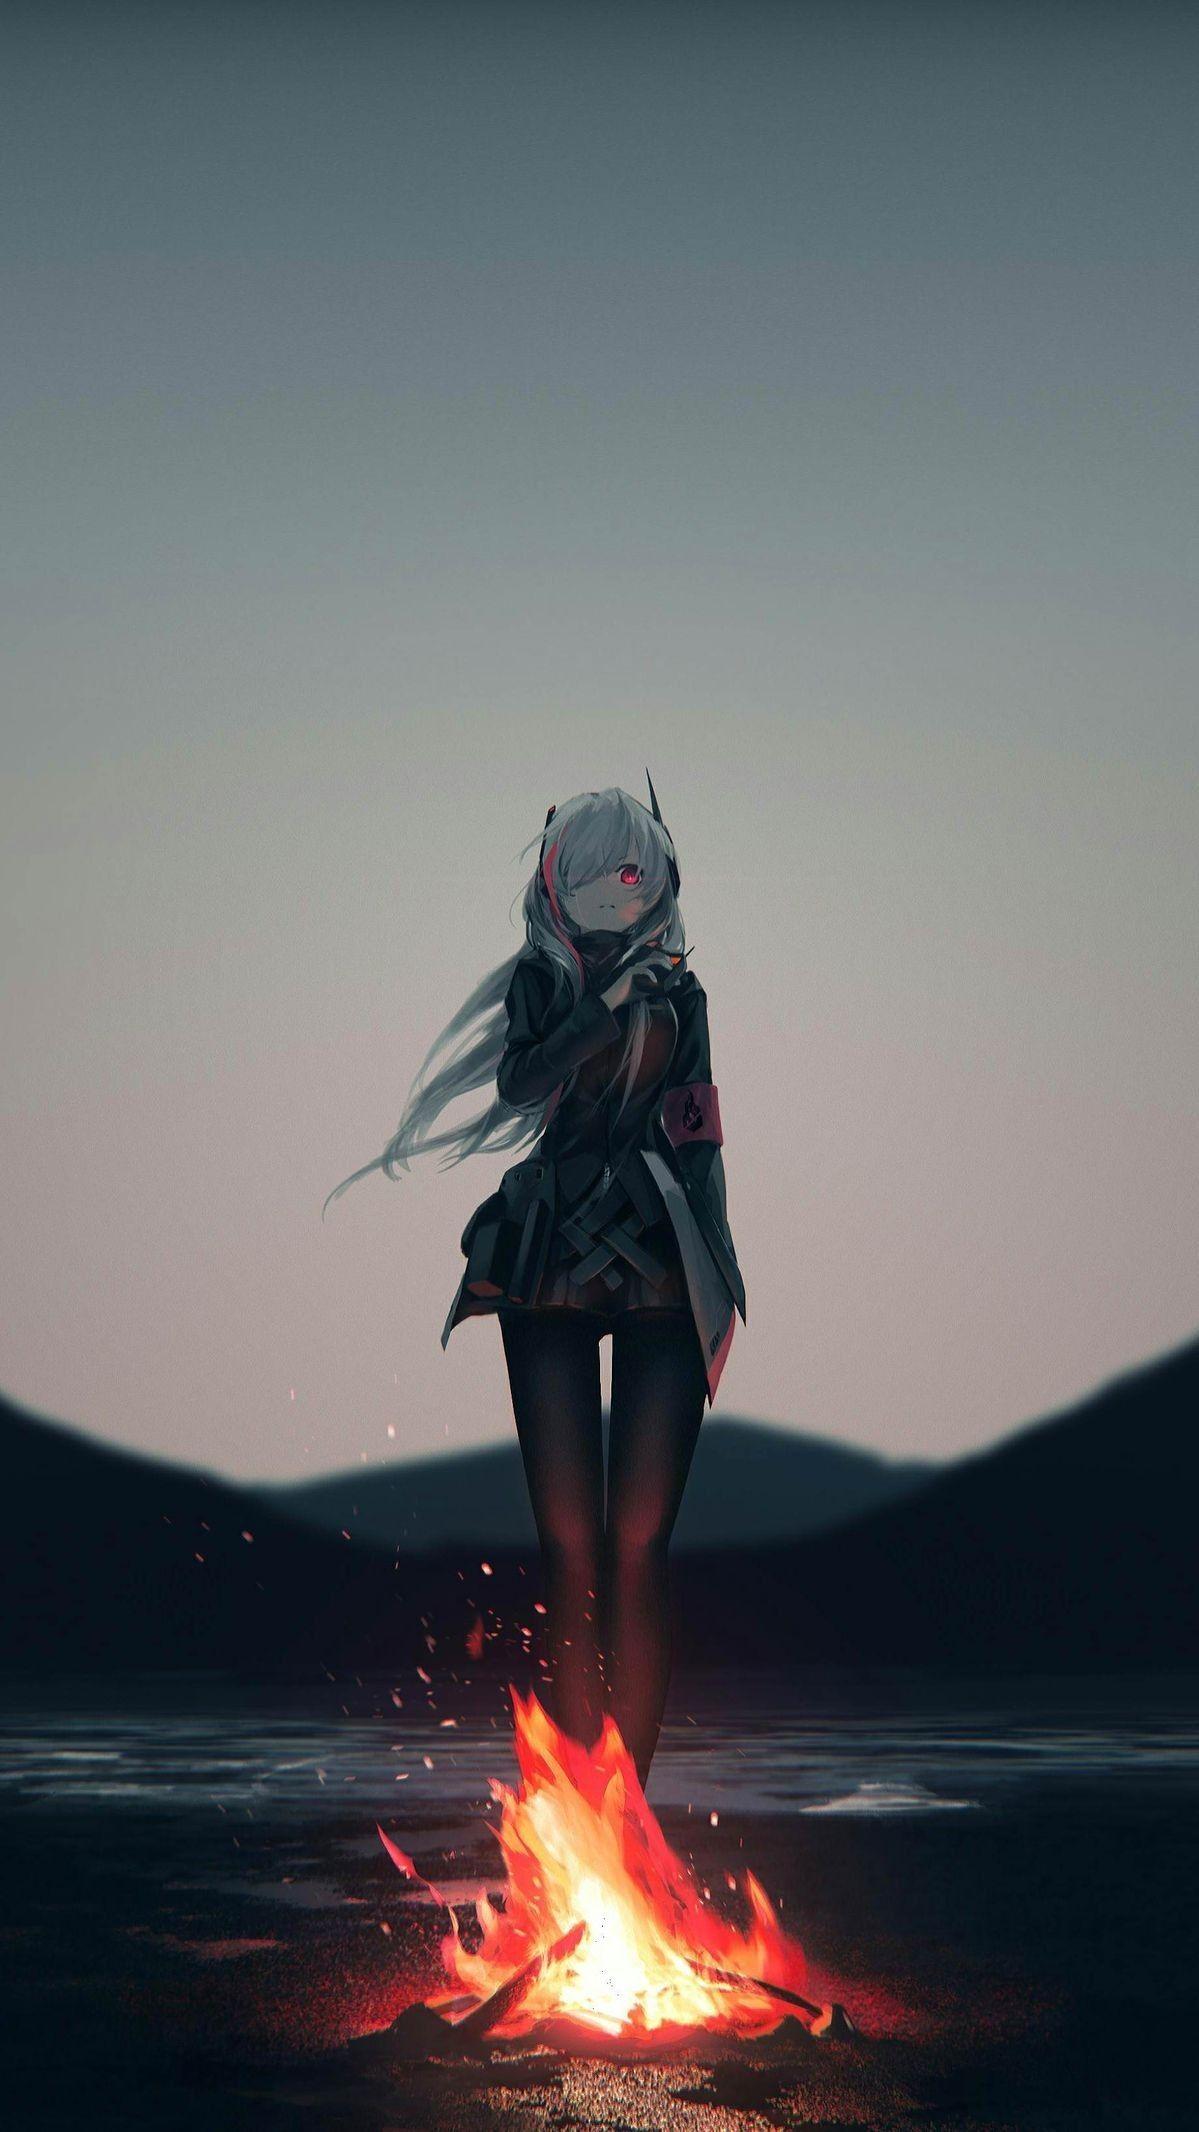 Pin By Xxsweetdeadxx 3 On Dark Light Dark Anime Anime Art Girl Anime Wallpaper